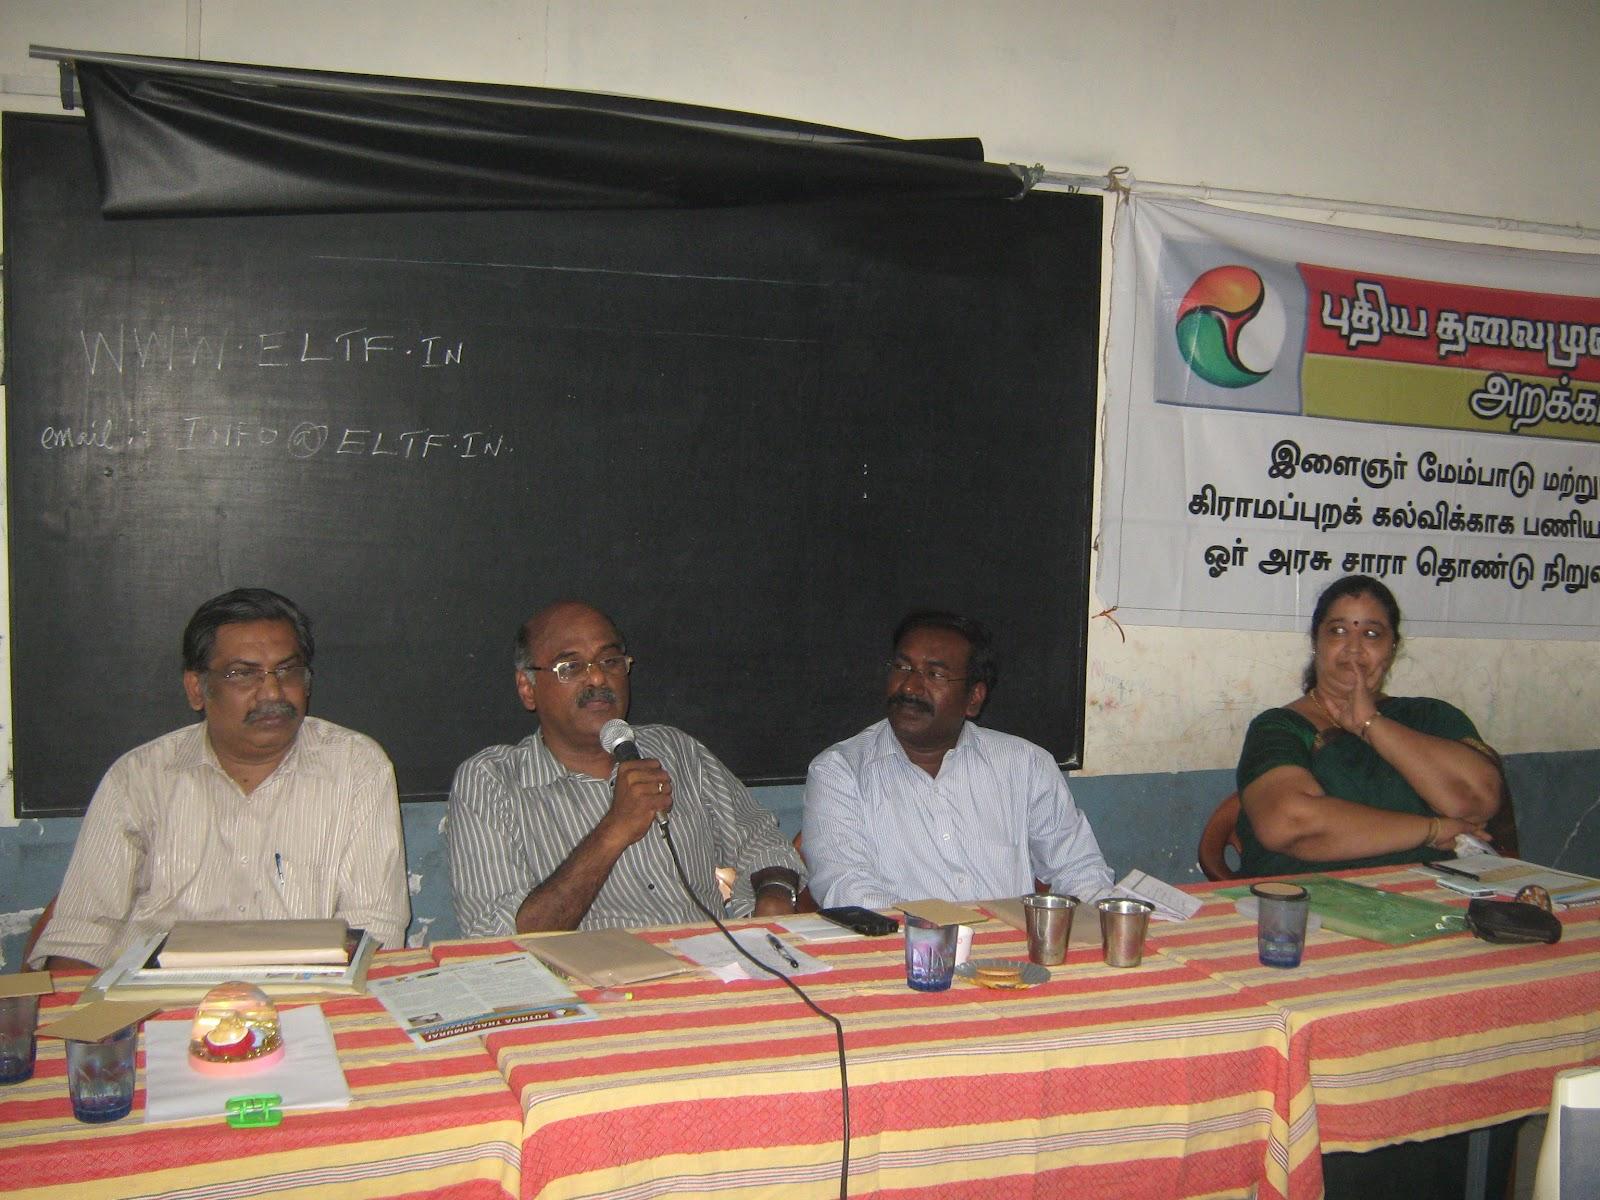 2012 prime point foundation l to r pon dhanasekaran prime point srinivasan r ramkumar n bhuvaneswari